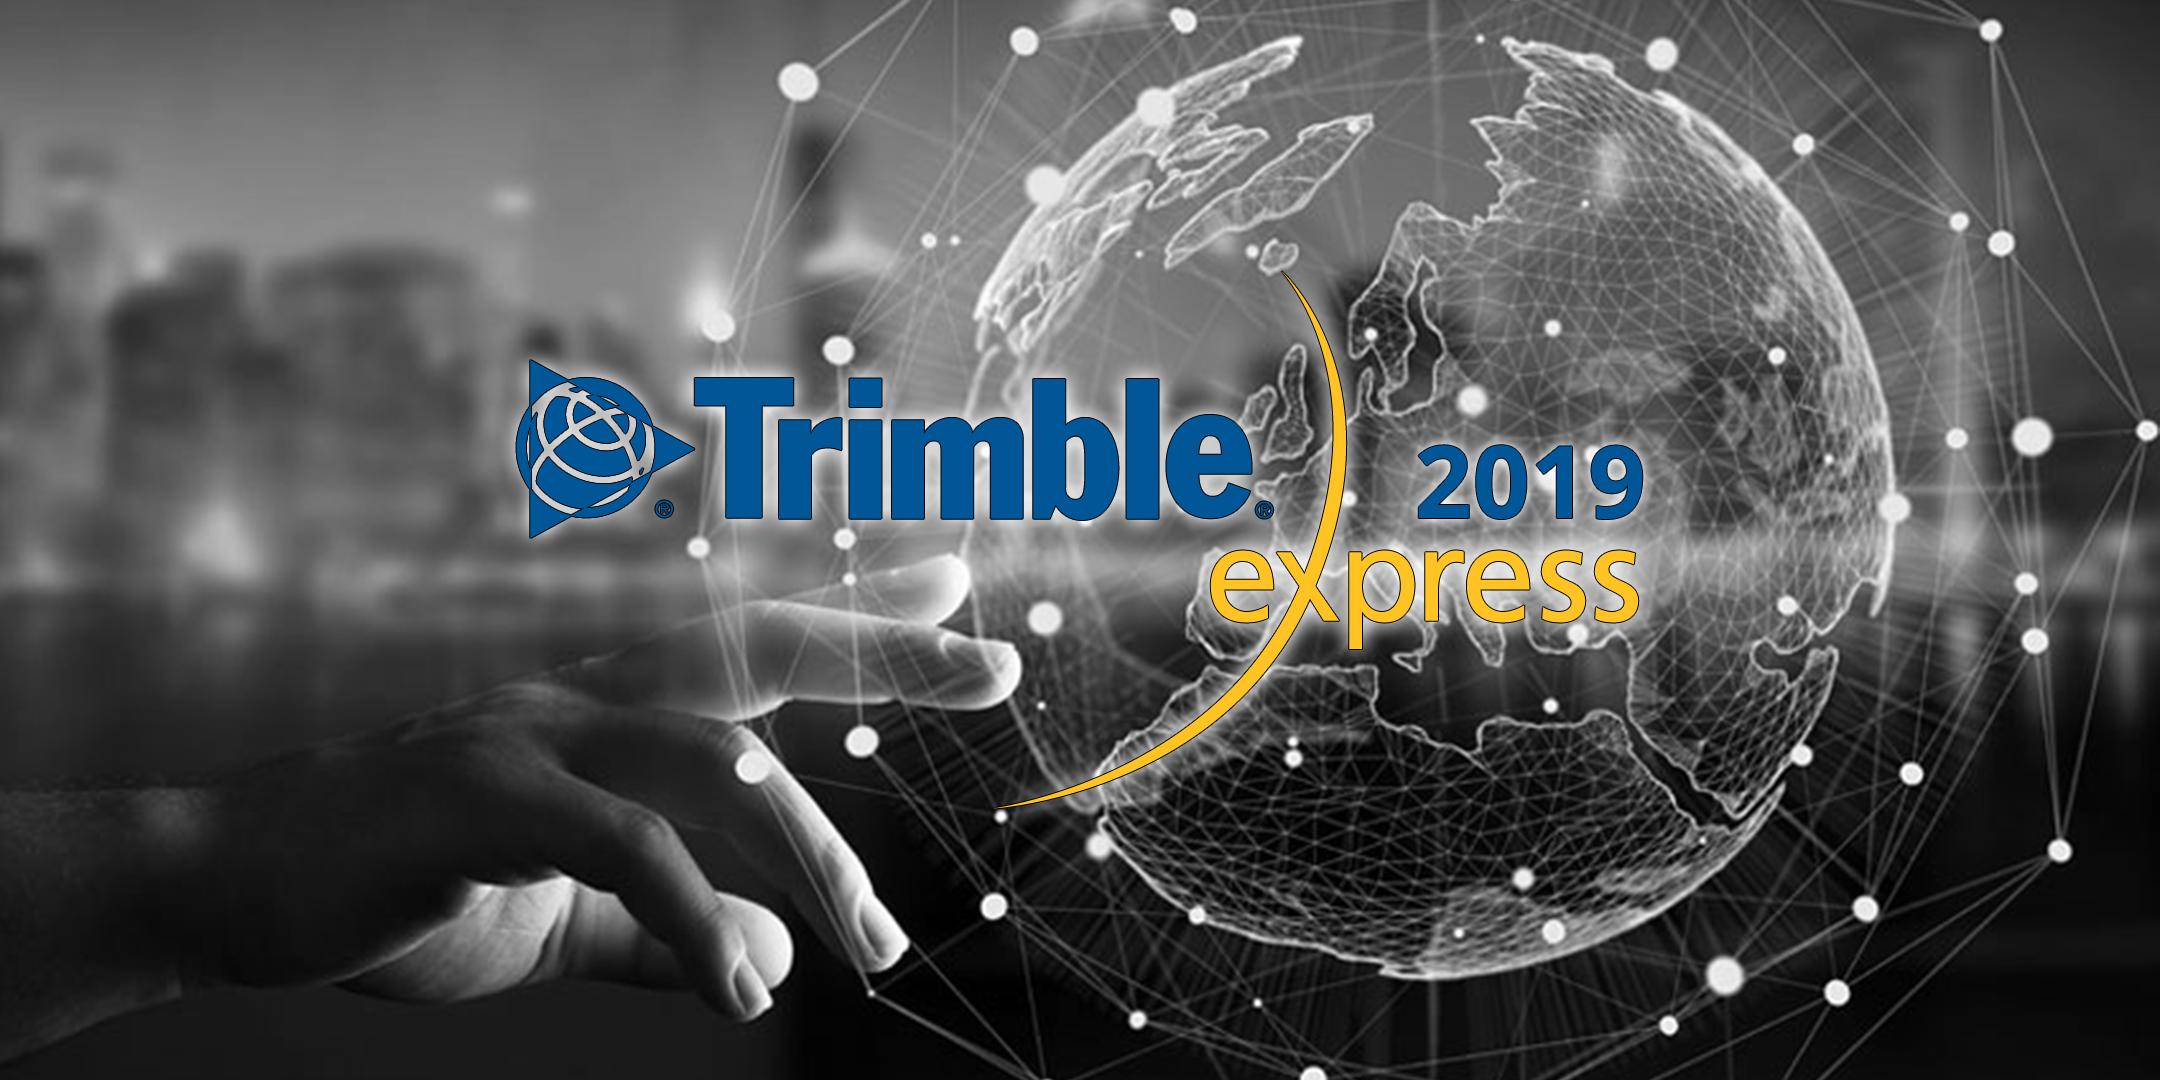 Jornada Técnica Trimble Express 2019